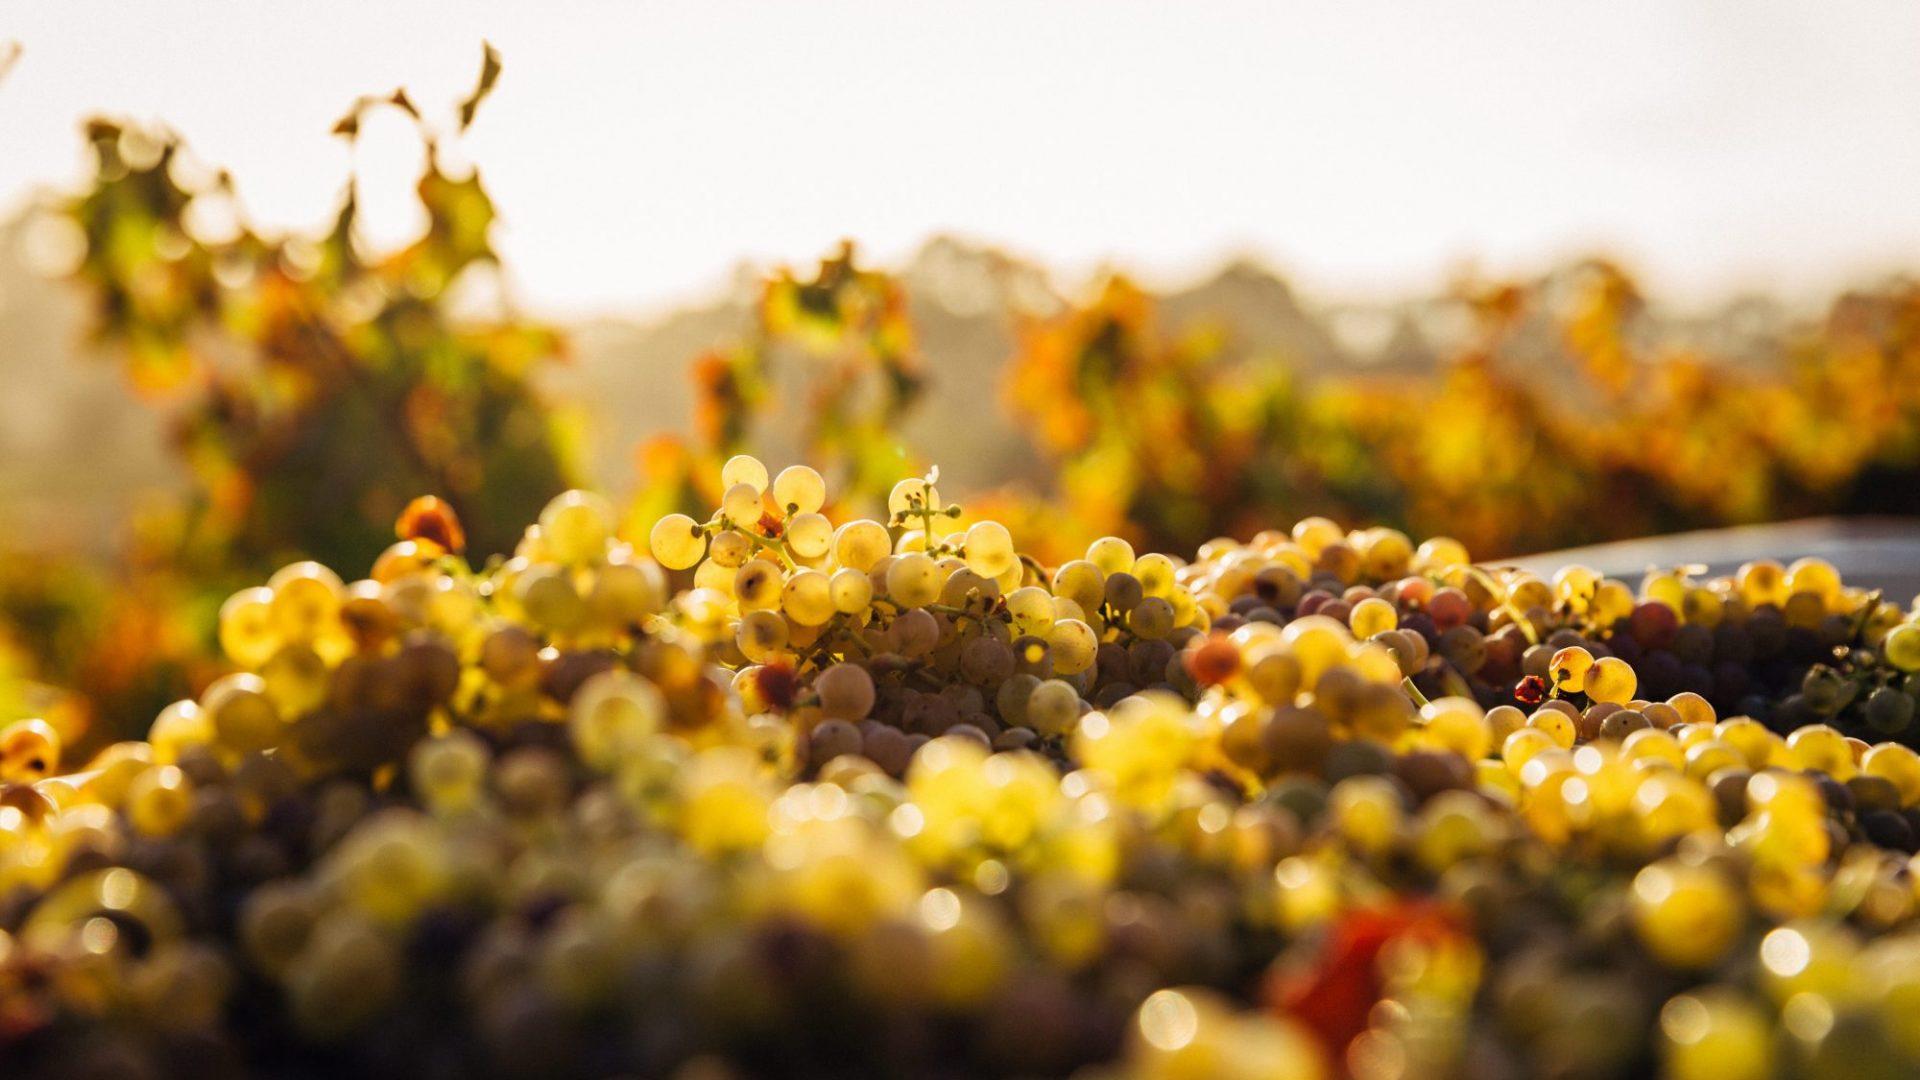 grapes blur-1853317